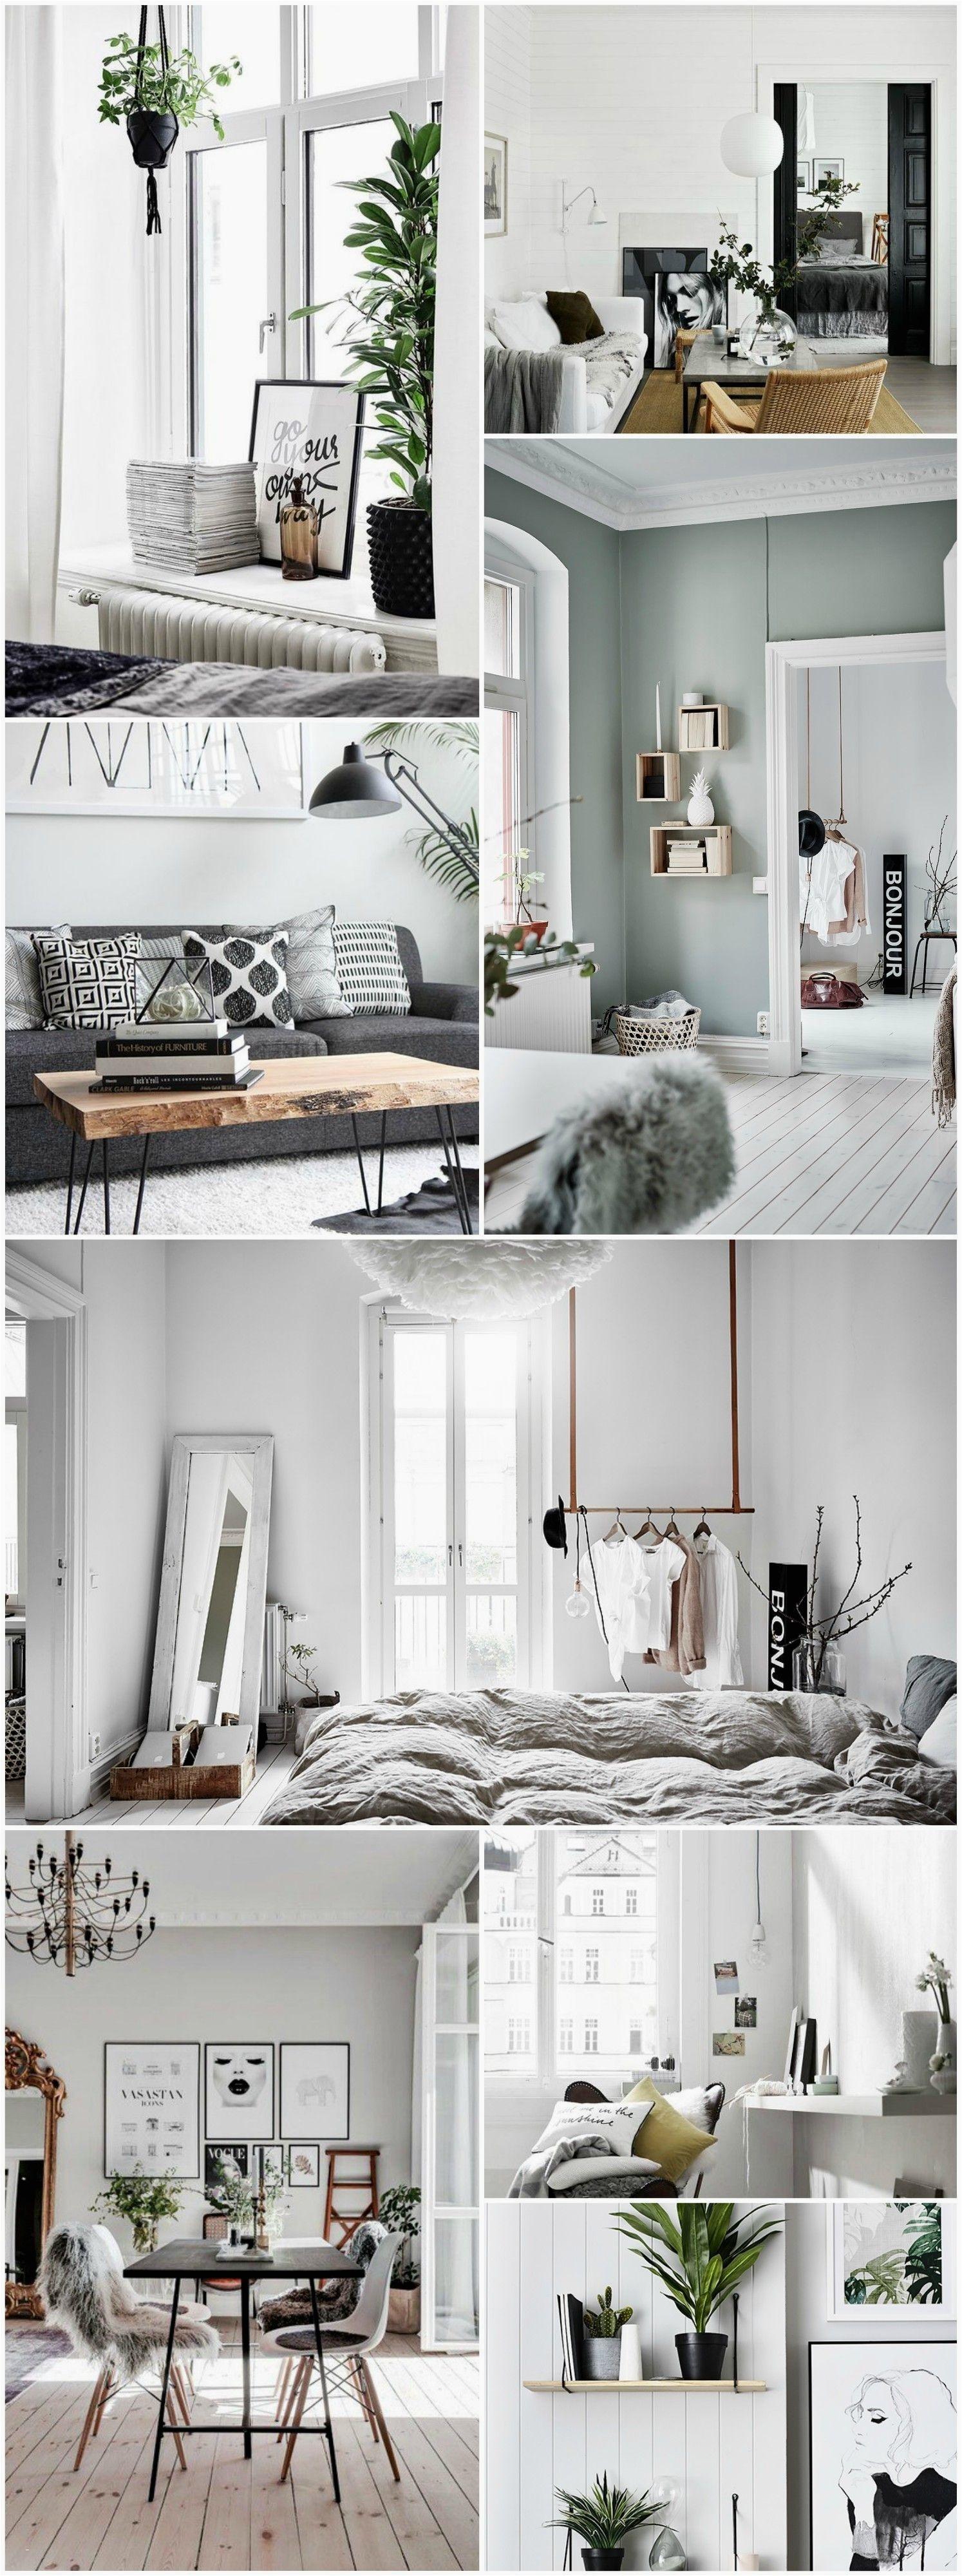 studio apartment furniture ikea fresh bedroom ideas for small rooms collection 42 elegant studio apartment